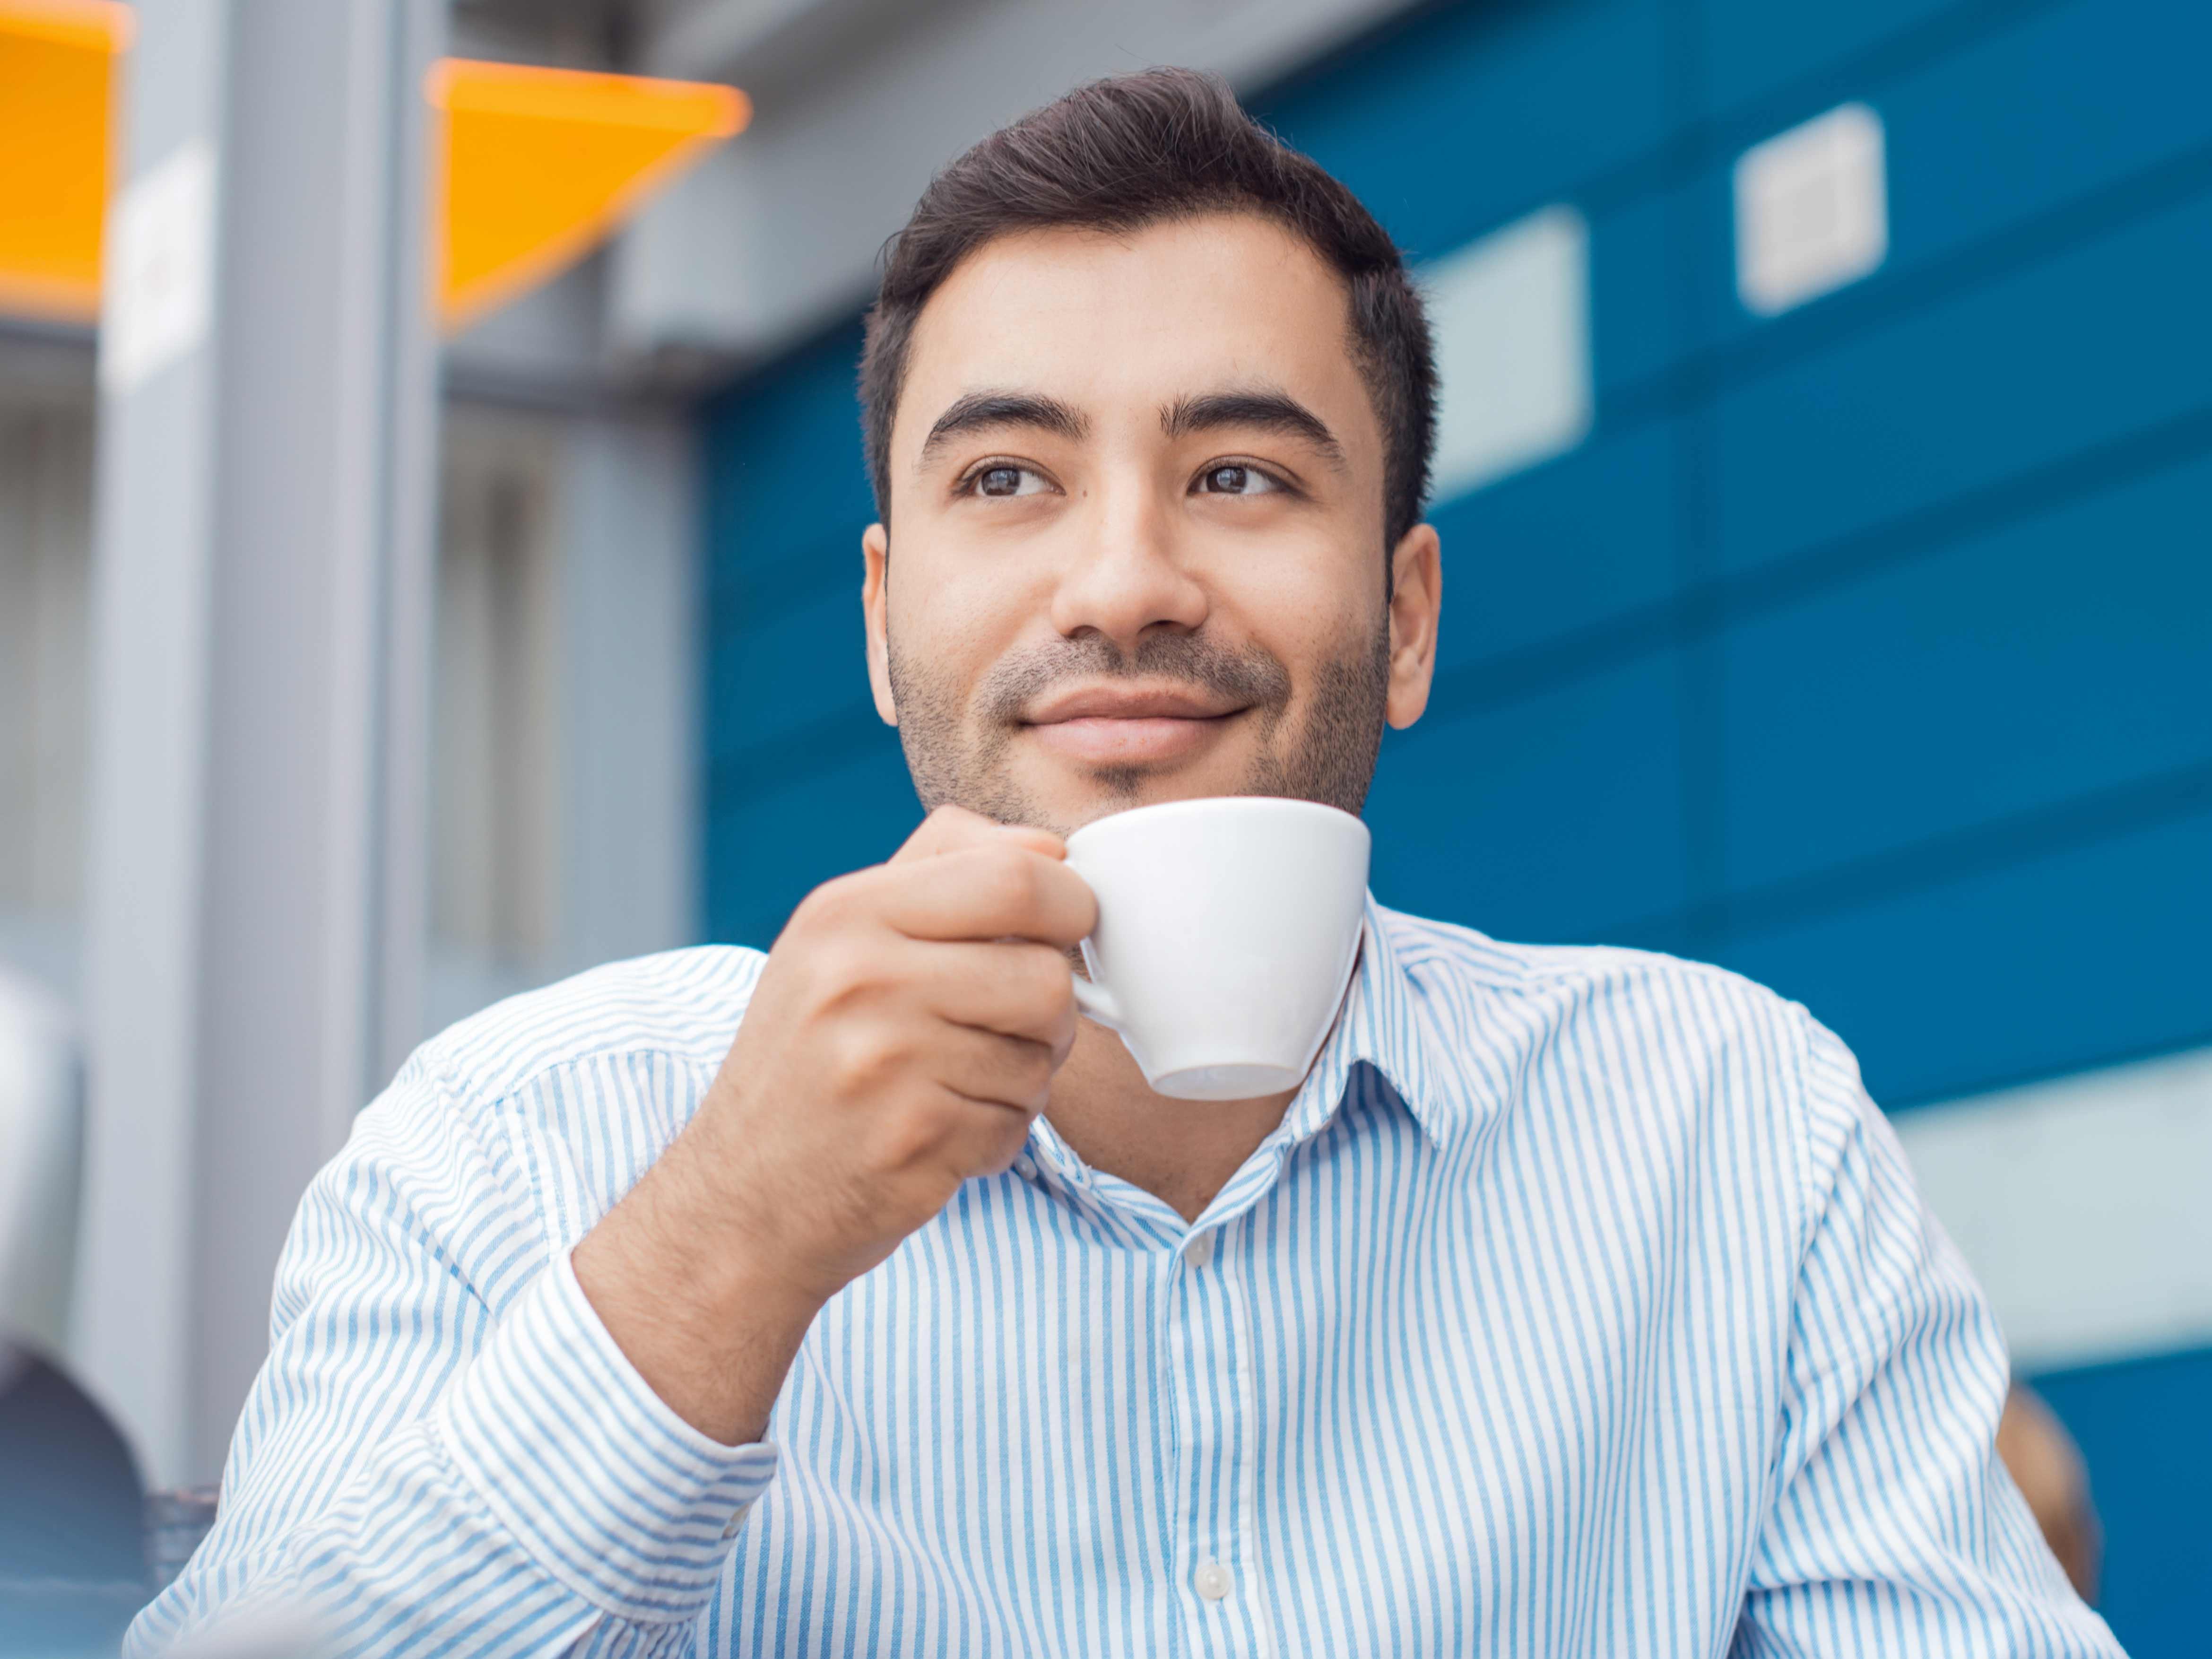 It's unanimous! Drinking coffee has big perks